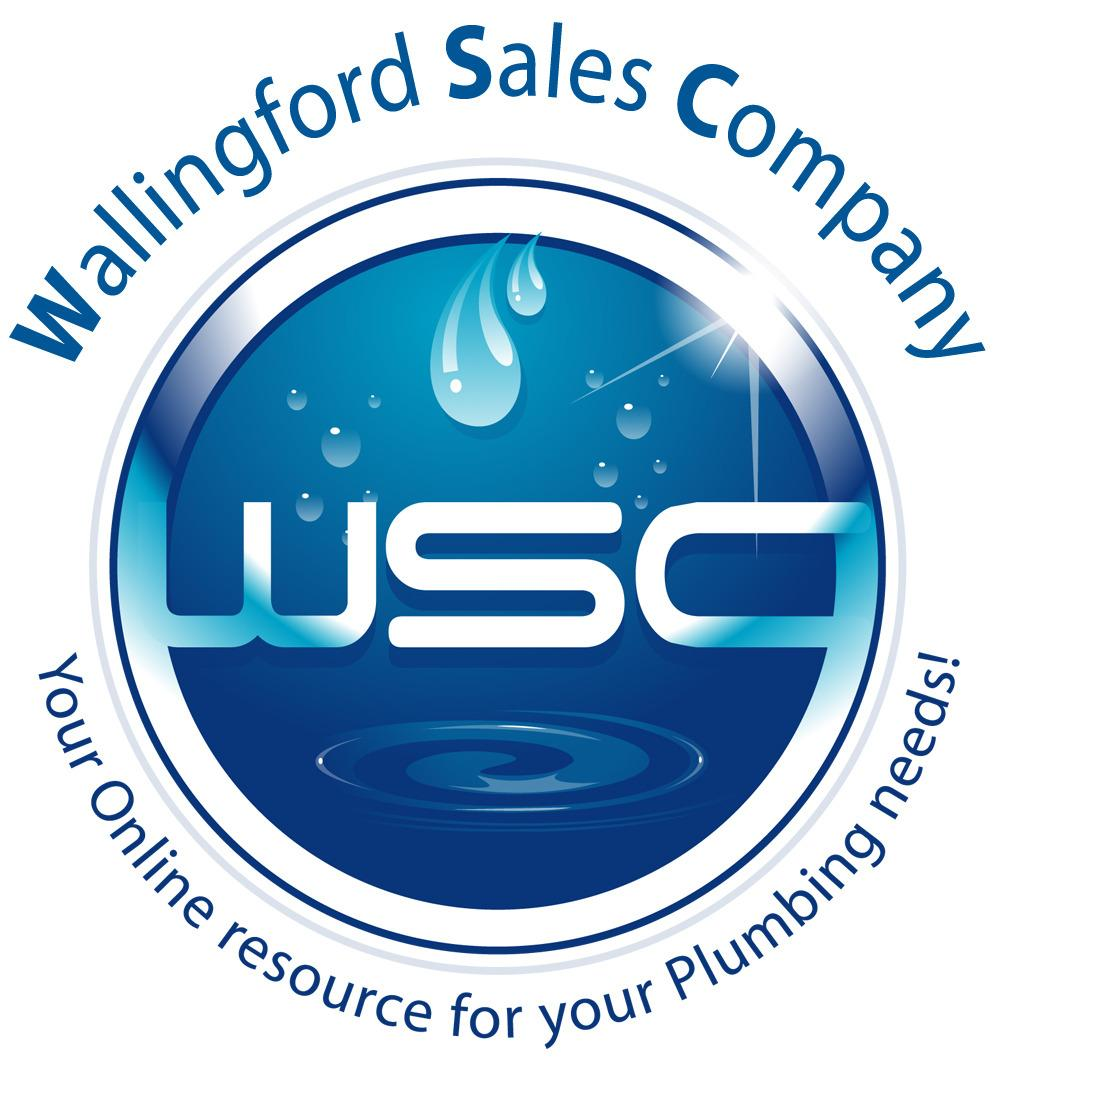 Wallingford Sales Company